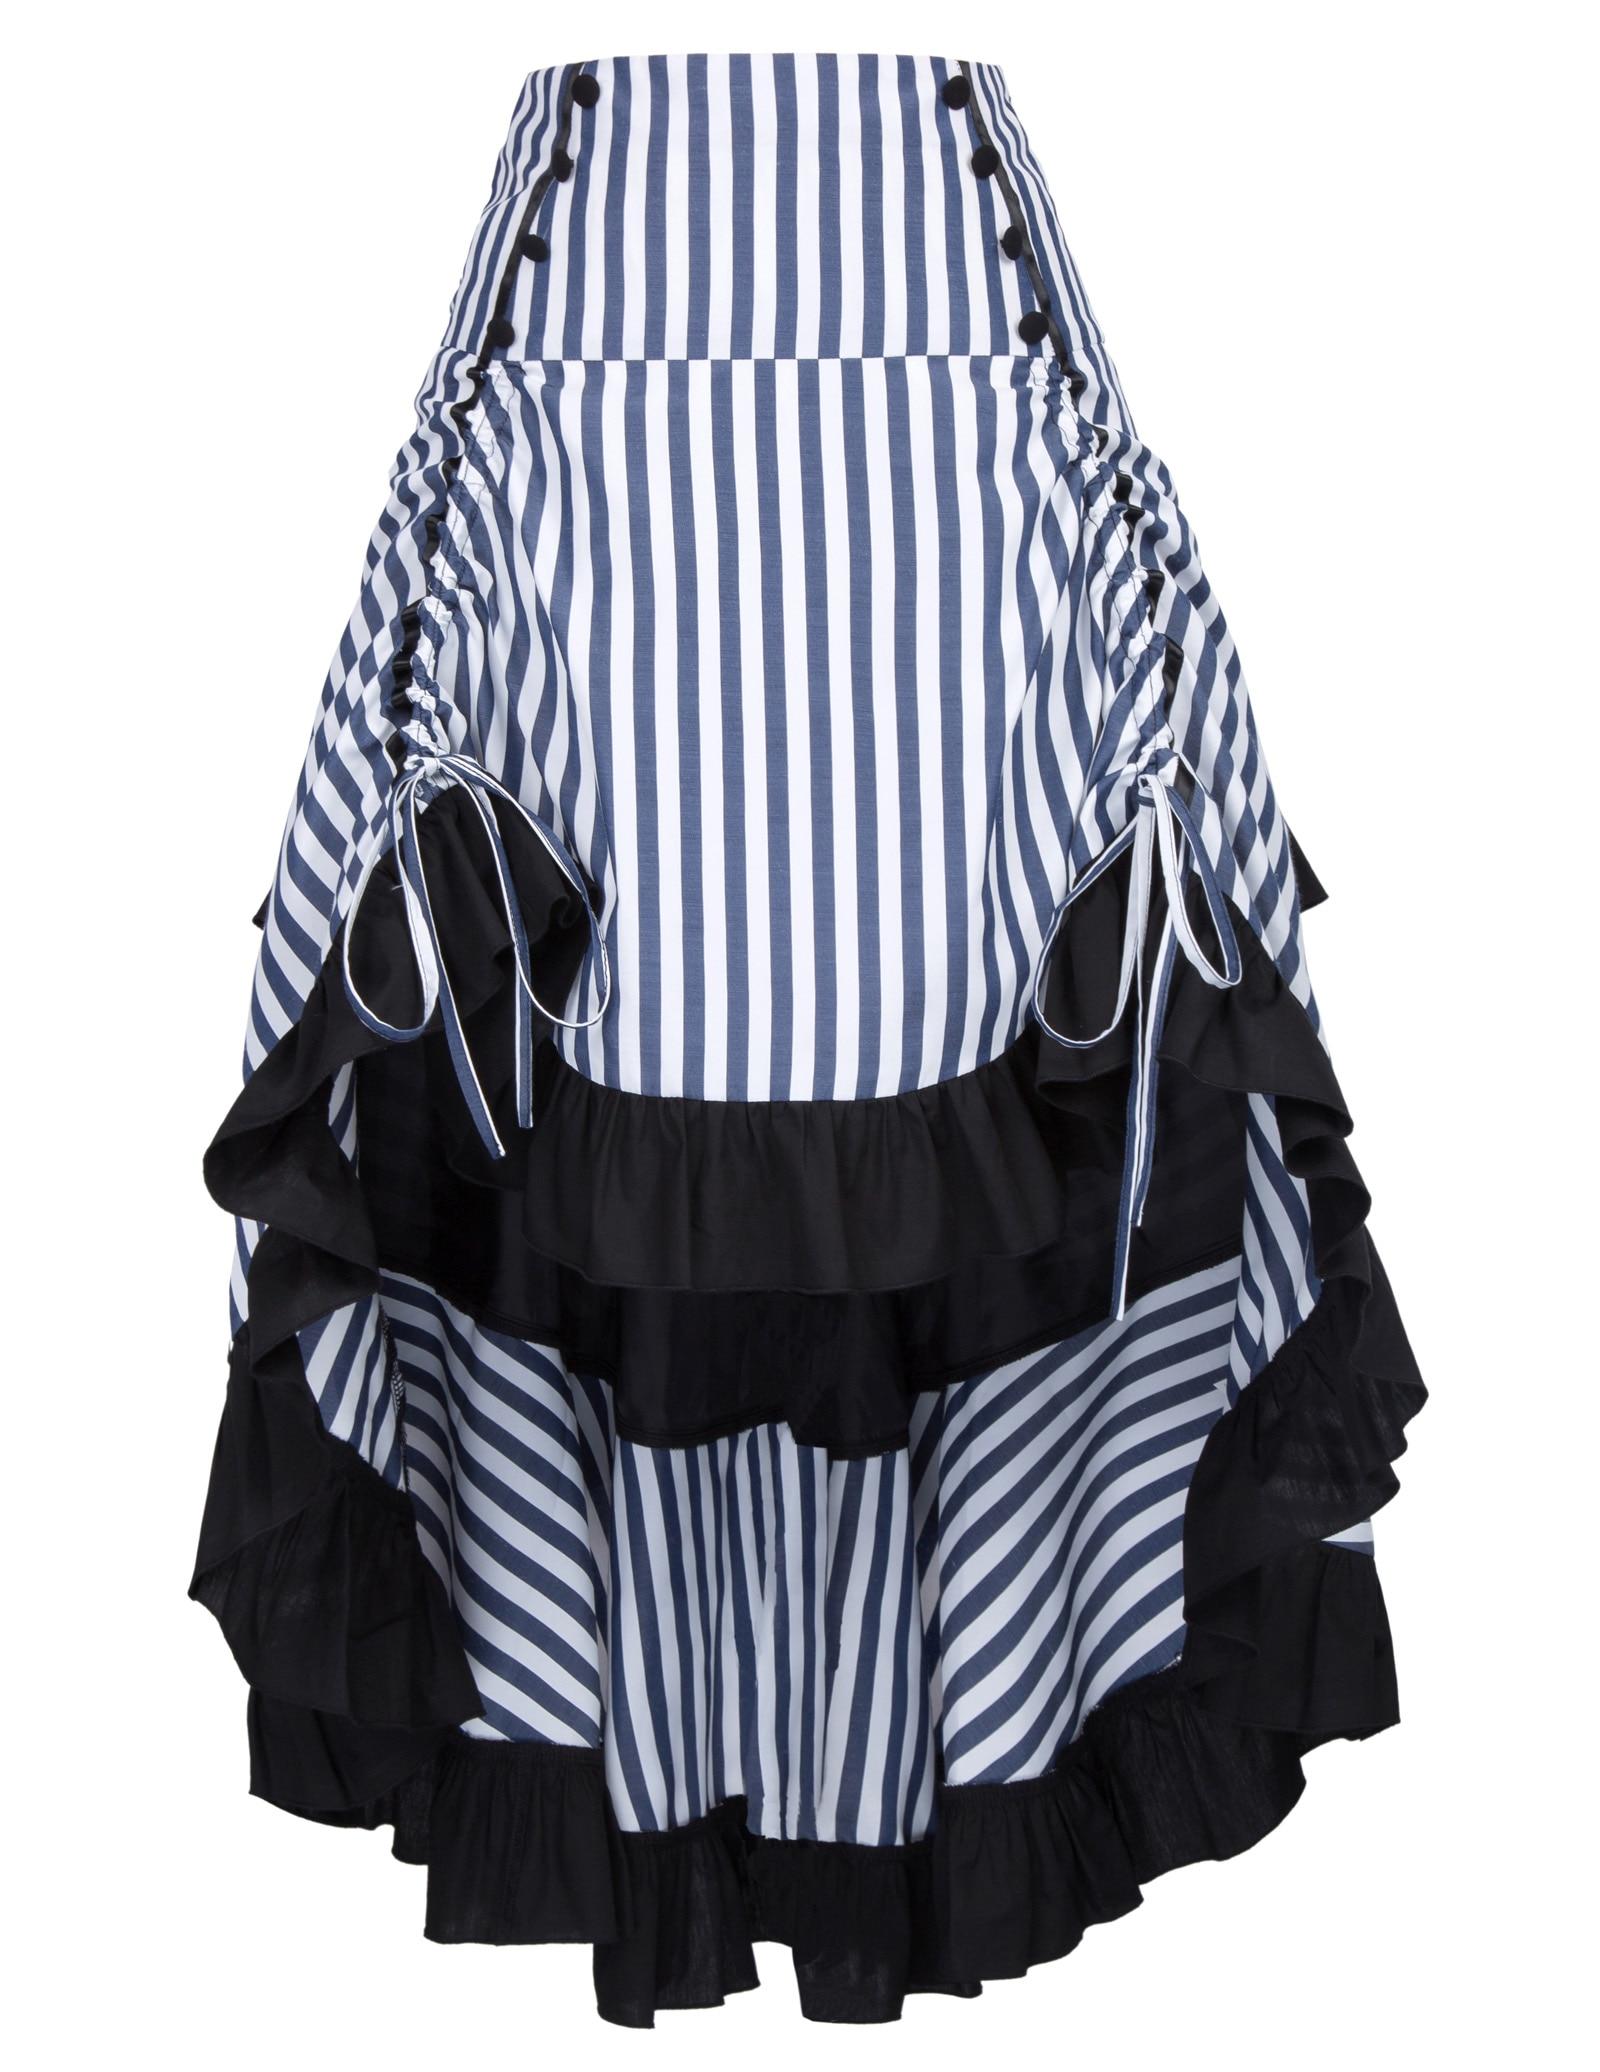 Vintage Striped Gathered Steampunk Gothic Punk Bustle Irregular Skirt  Elastic